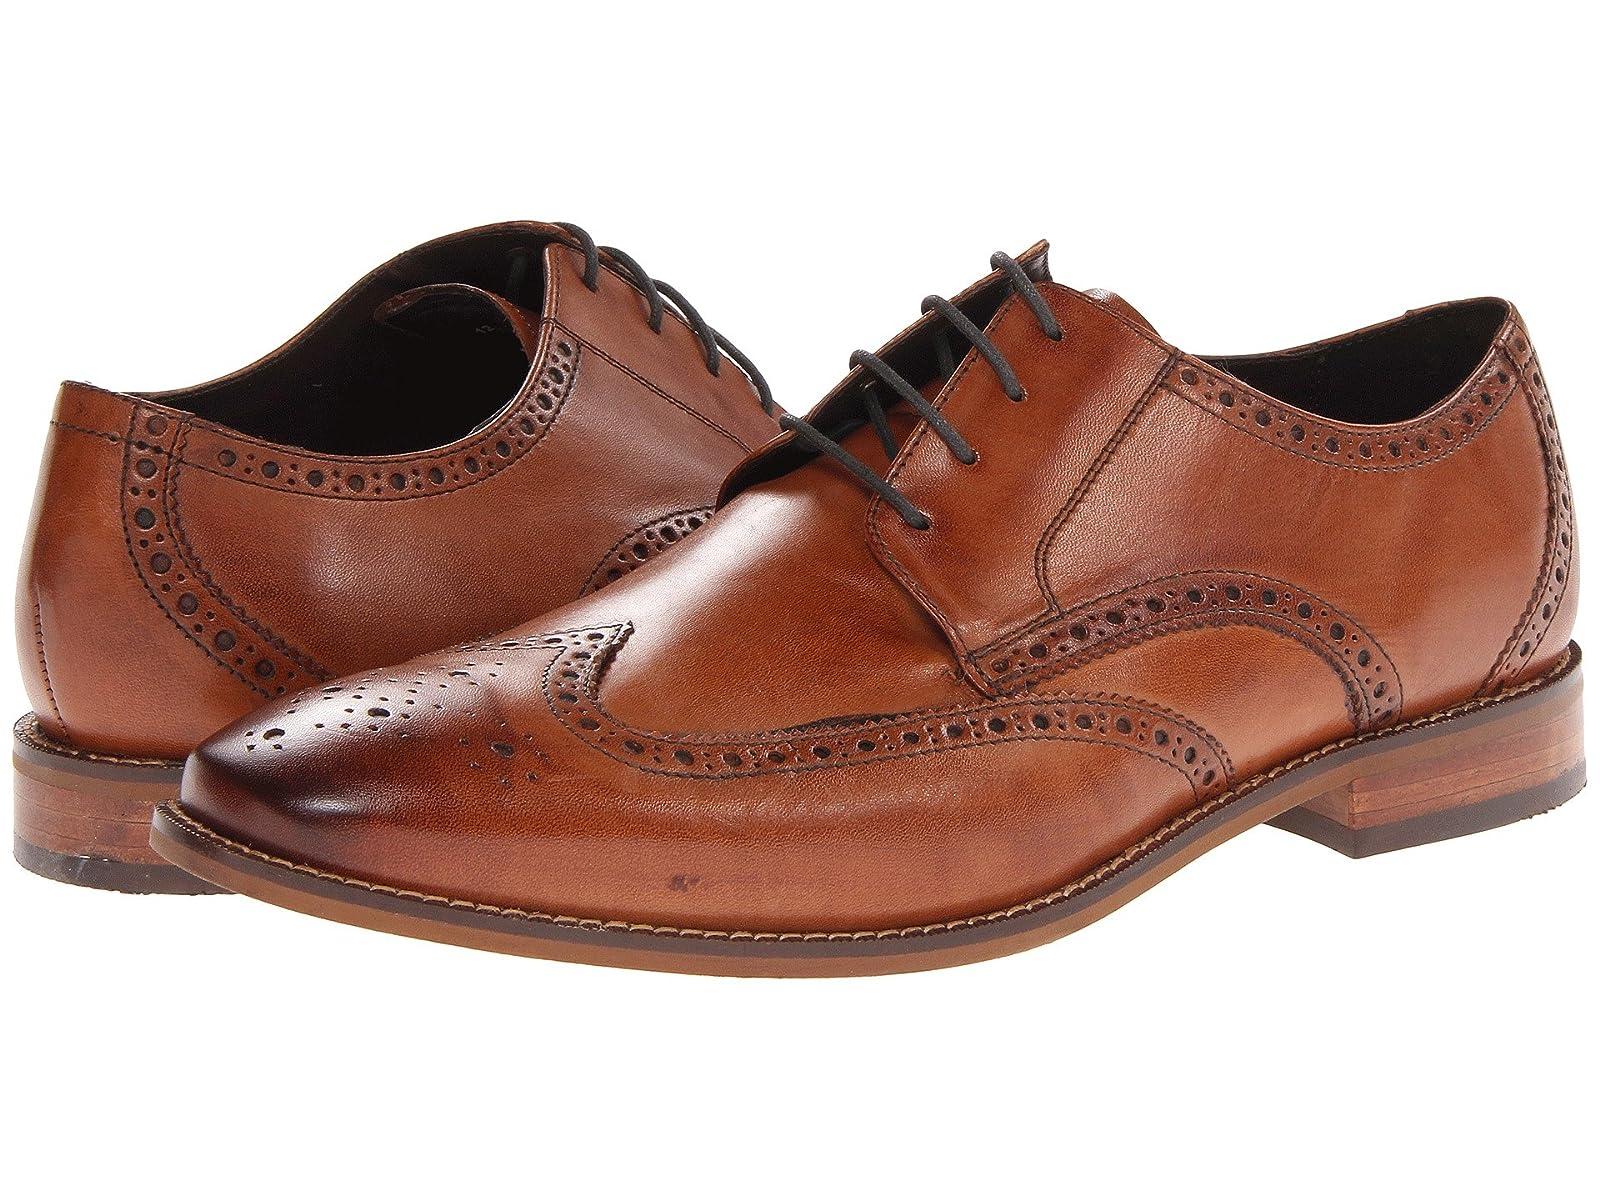 Florsheim Castellano Wingtip OxfordAtmospheric grades have affordable shoes